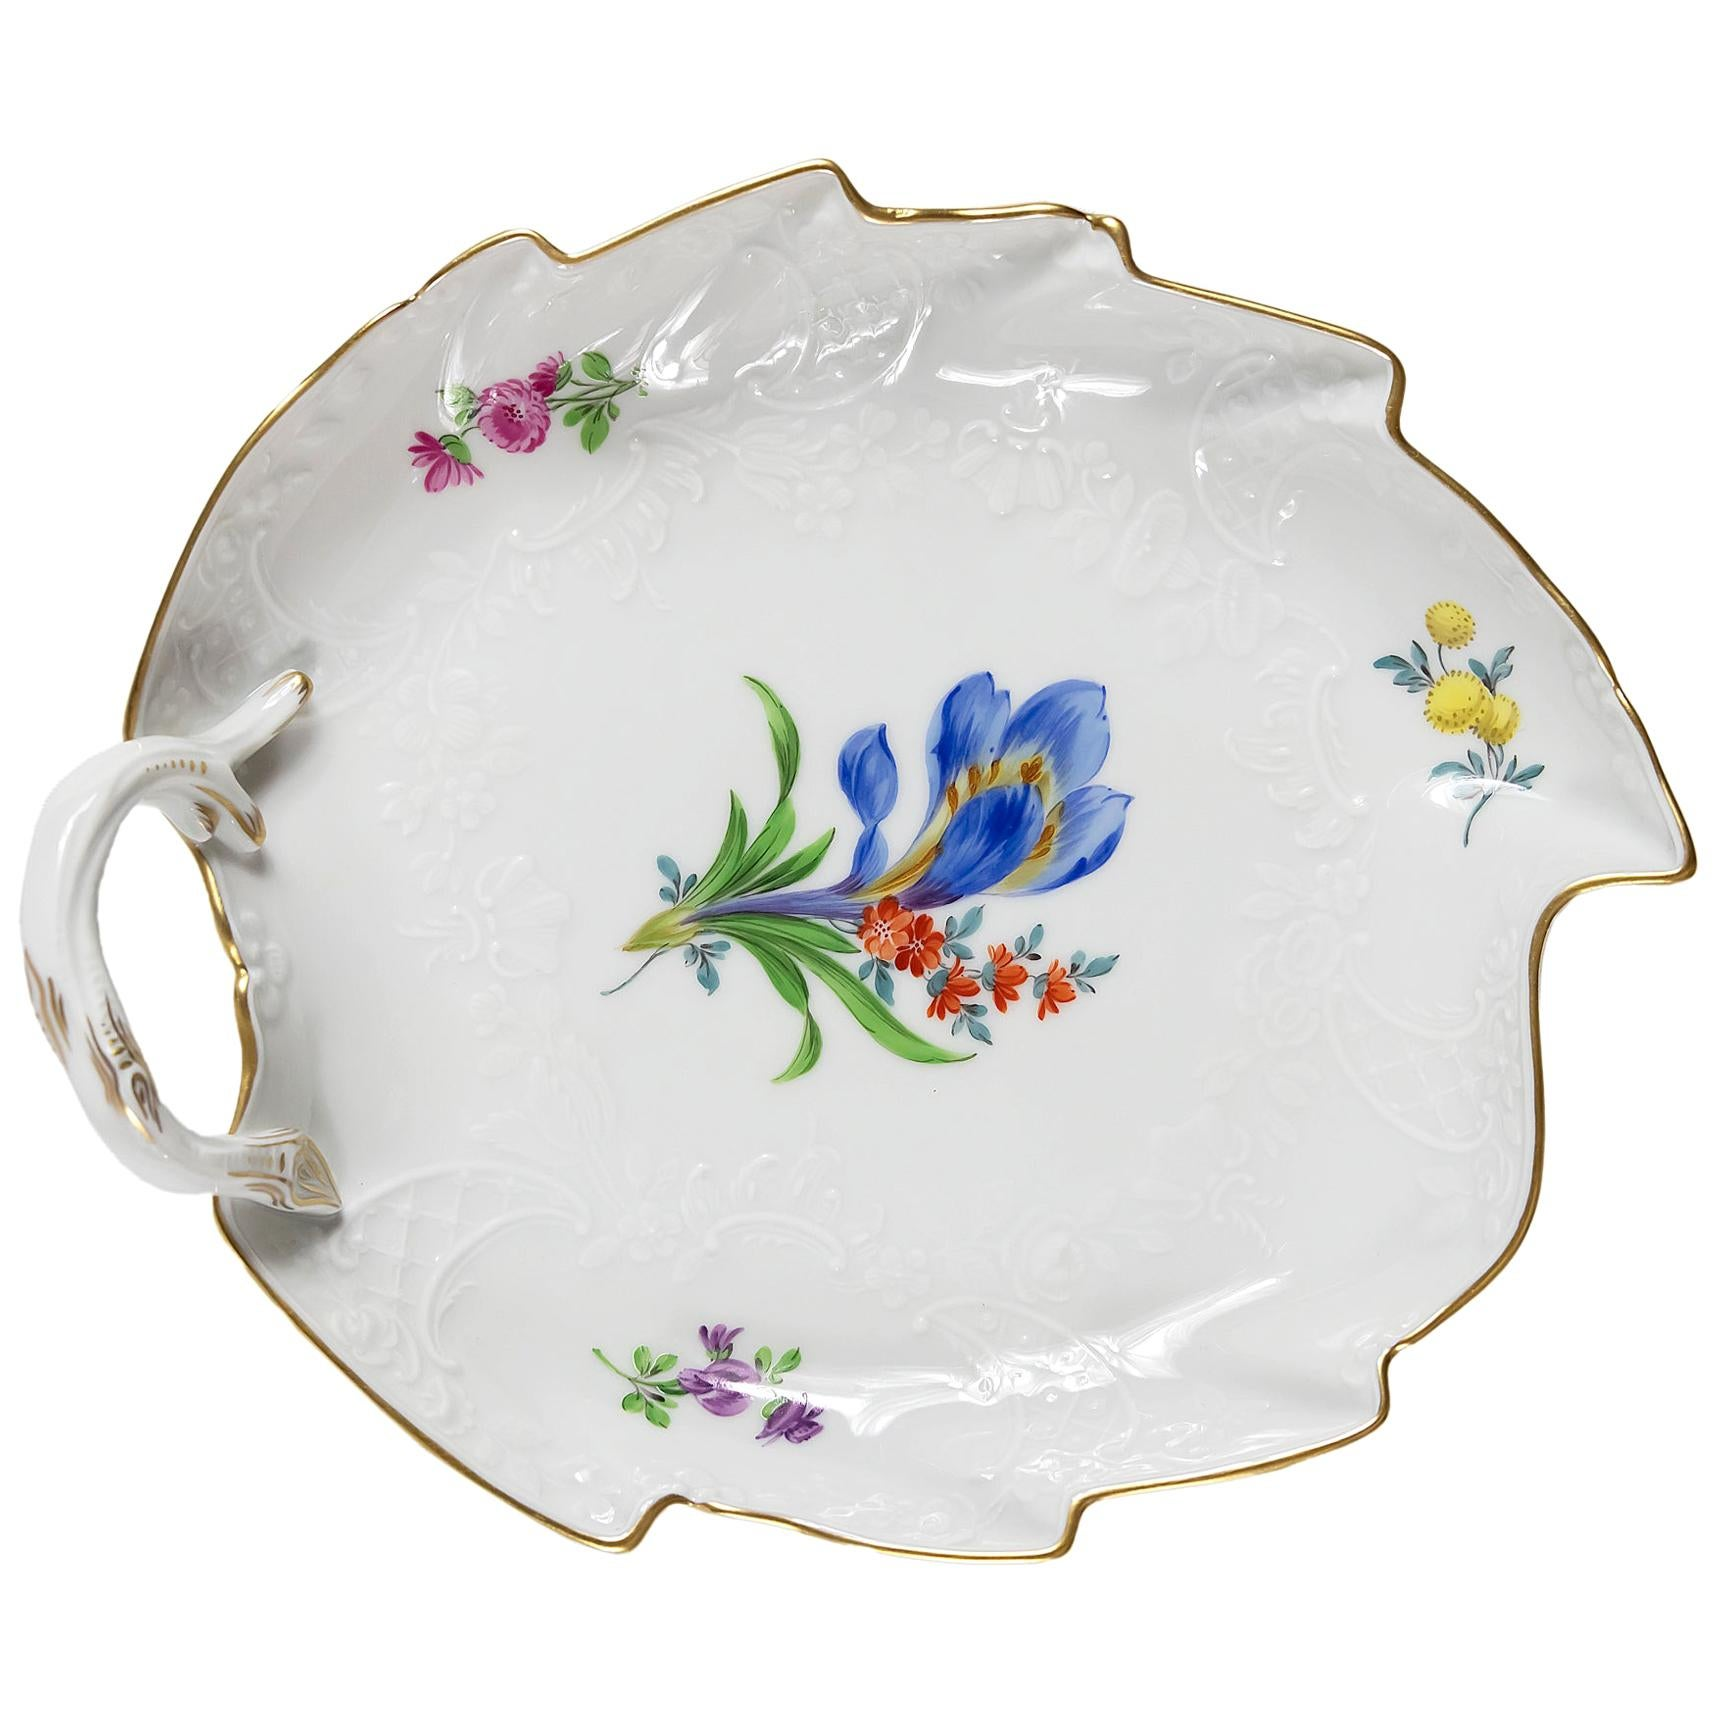 Meissen Porcelain Leaf Form Plate with Handle